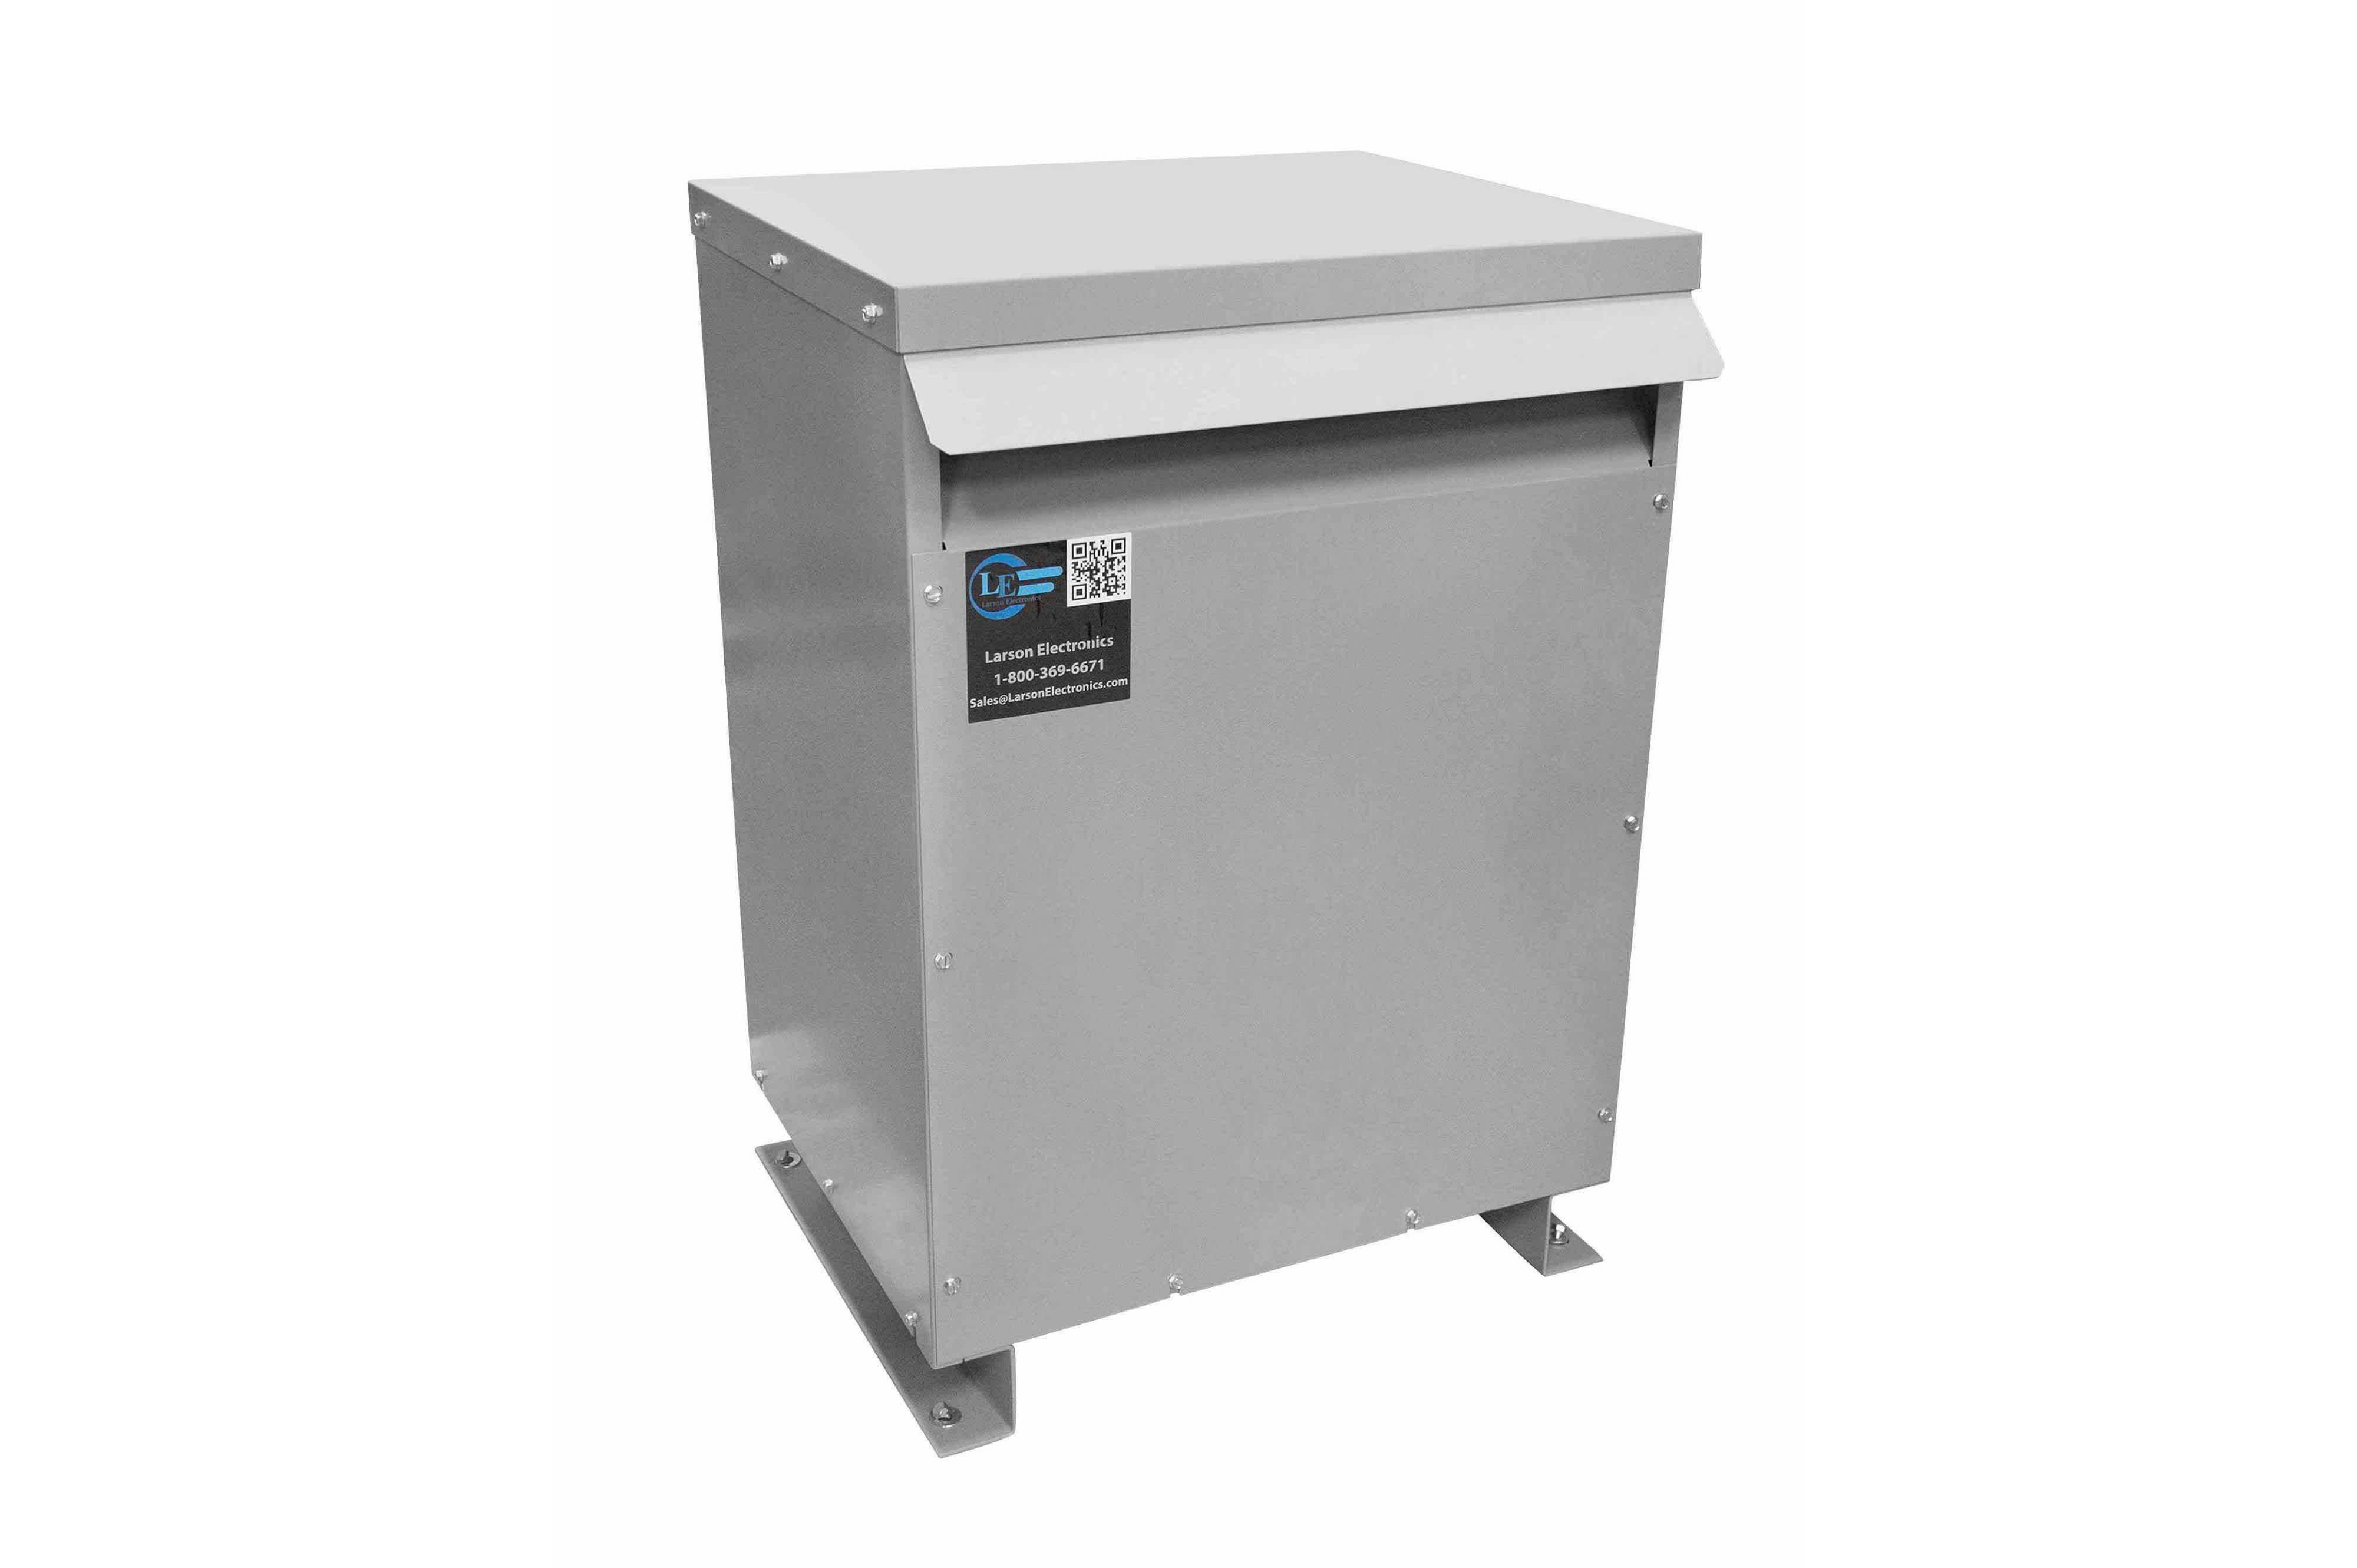 12 kVA 3PH Isolation Transformer, 480V Wye Primary, 480Y/277 Wye-N Secondary, N3R, Ventilated, 60 Hz